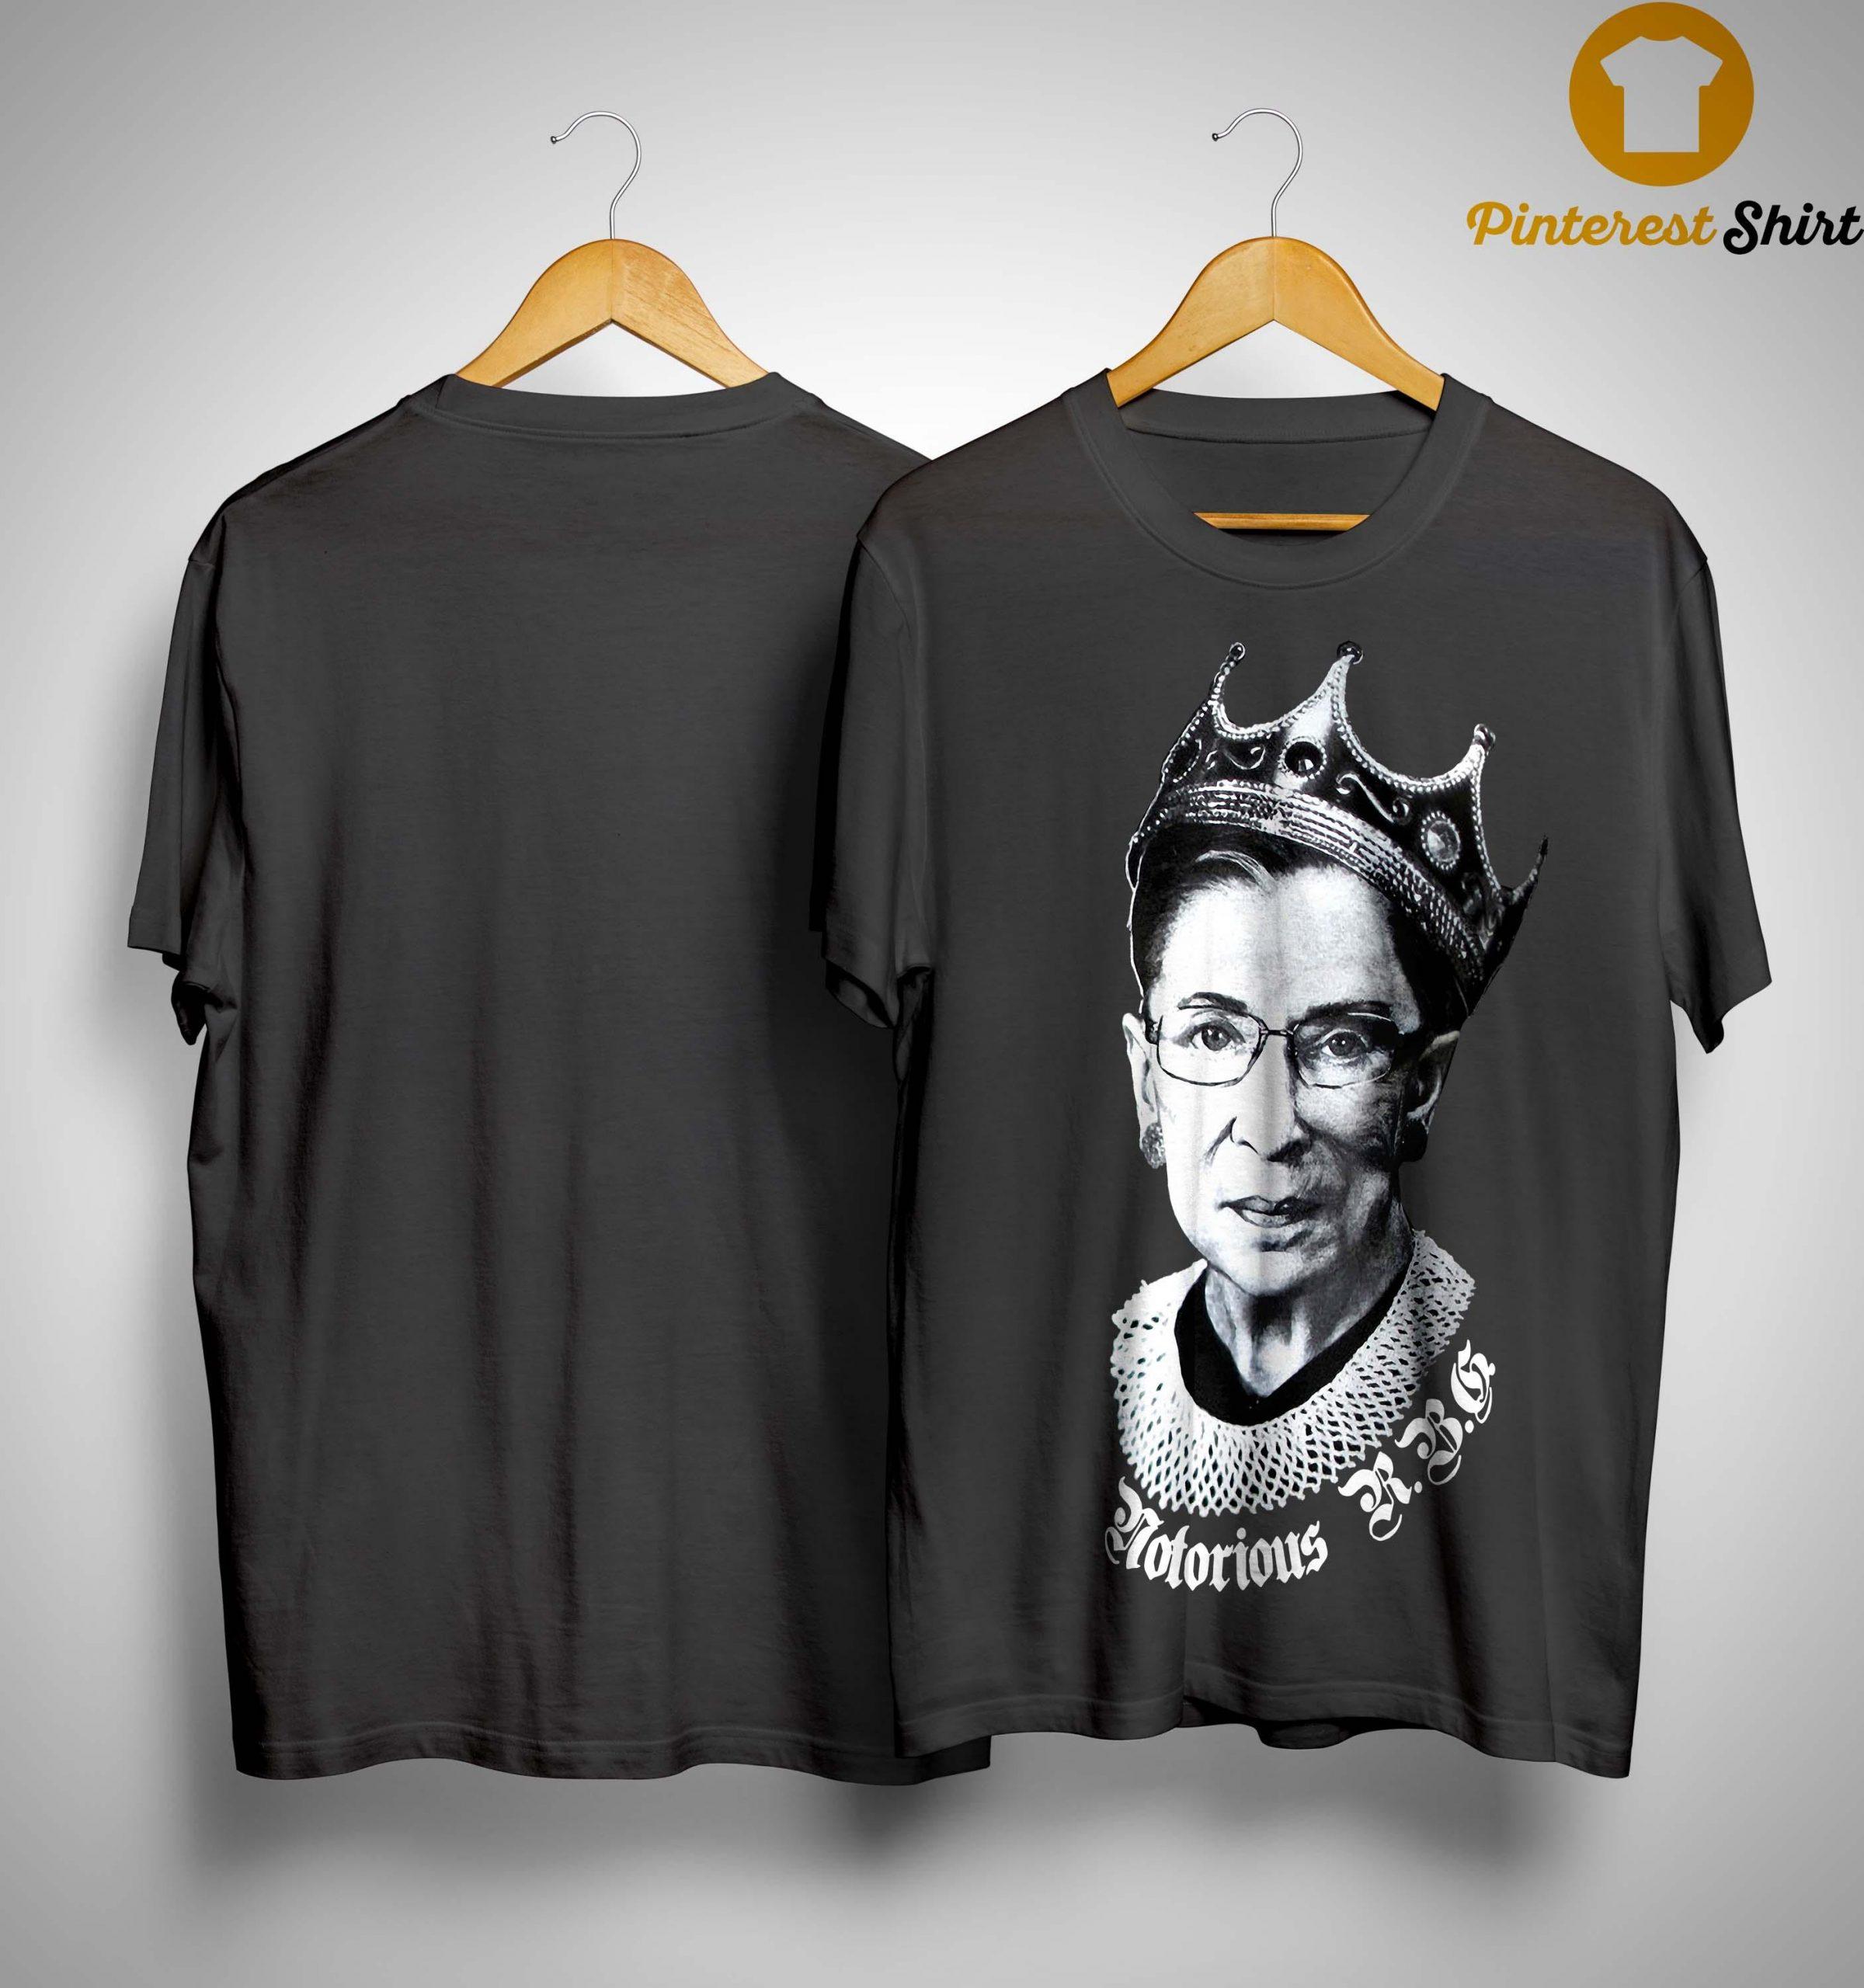 Pop Culture Icon Ruth Bader Ginsburg T Shirt